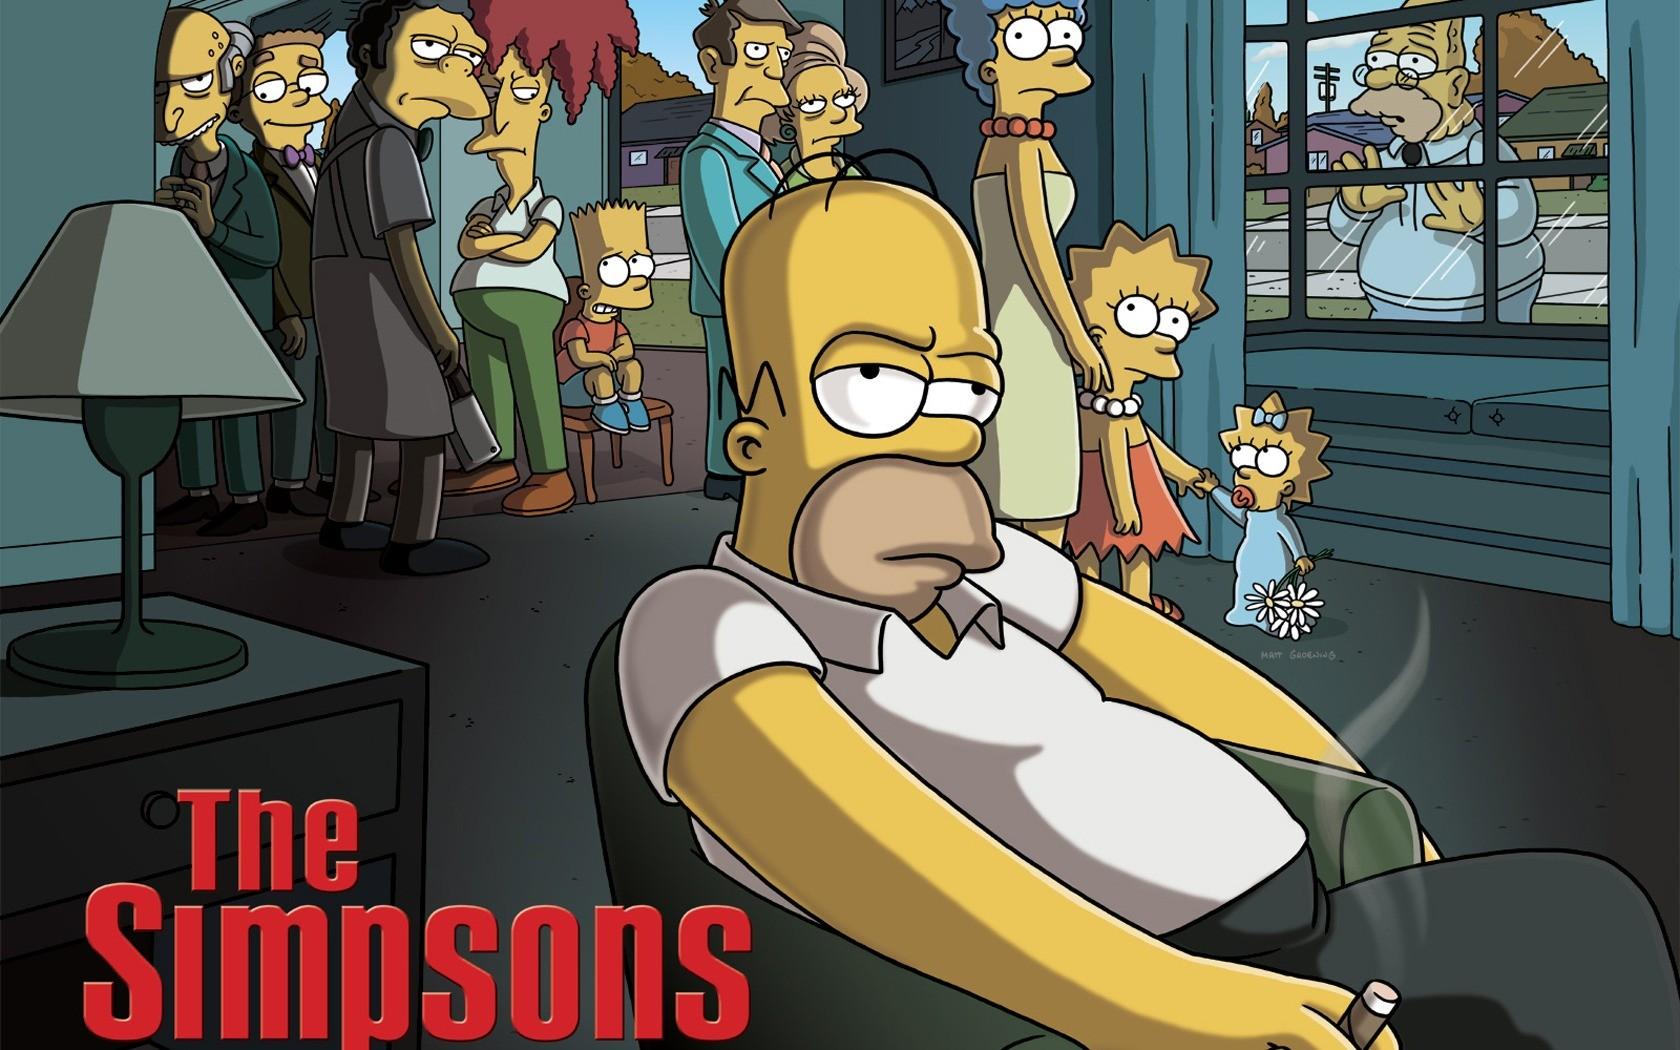 Ilustrasi anime gambar kartun simpsons parodi televisi komik homer simpson bart simpson marge simpson lisa simpson